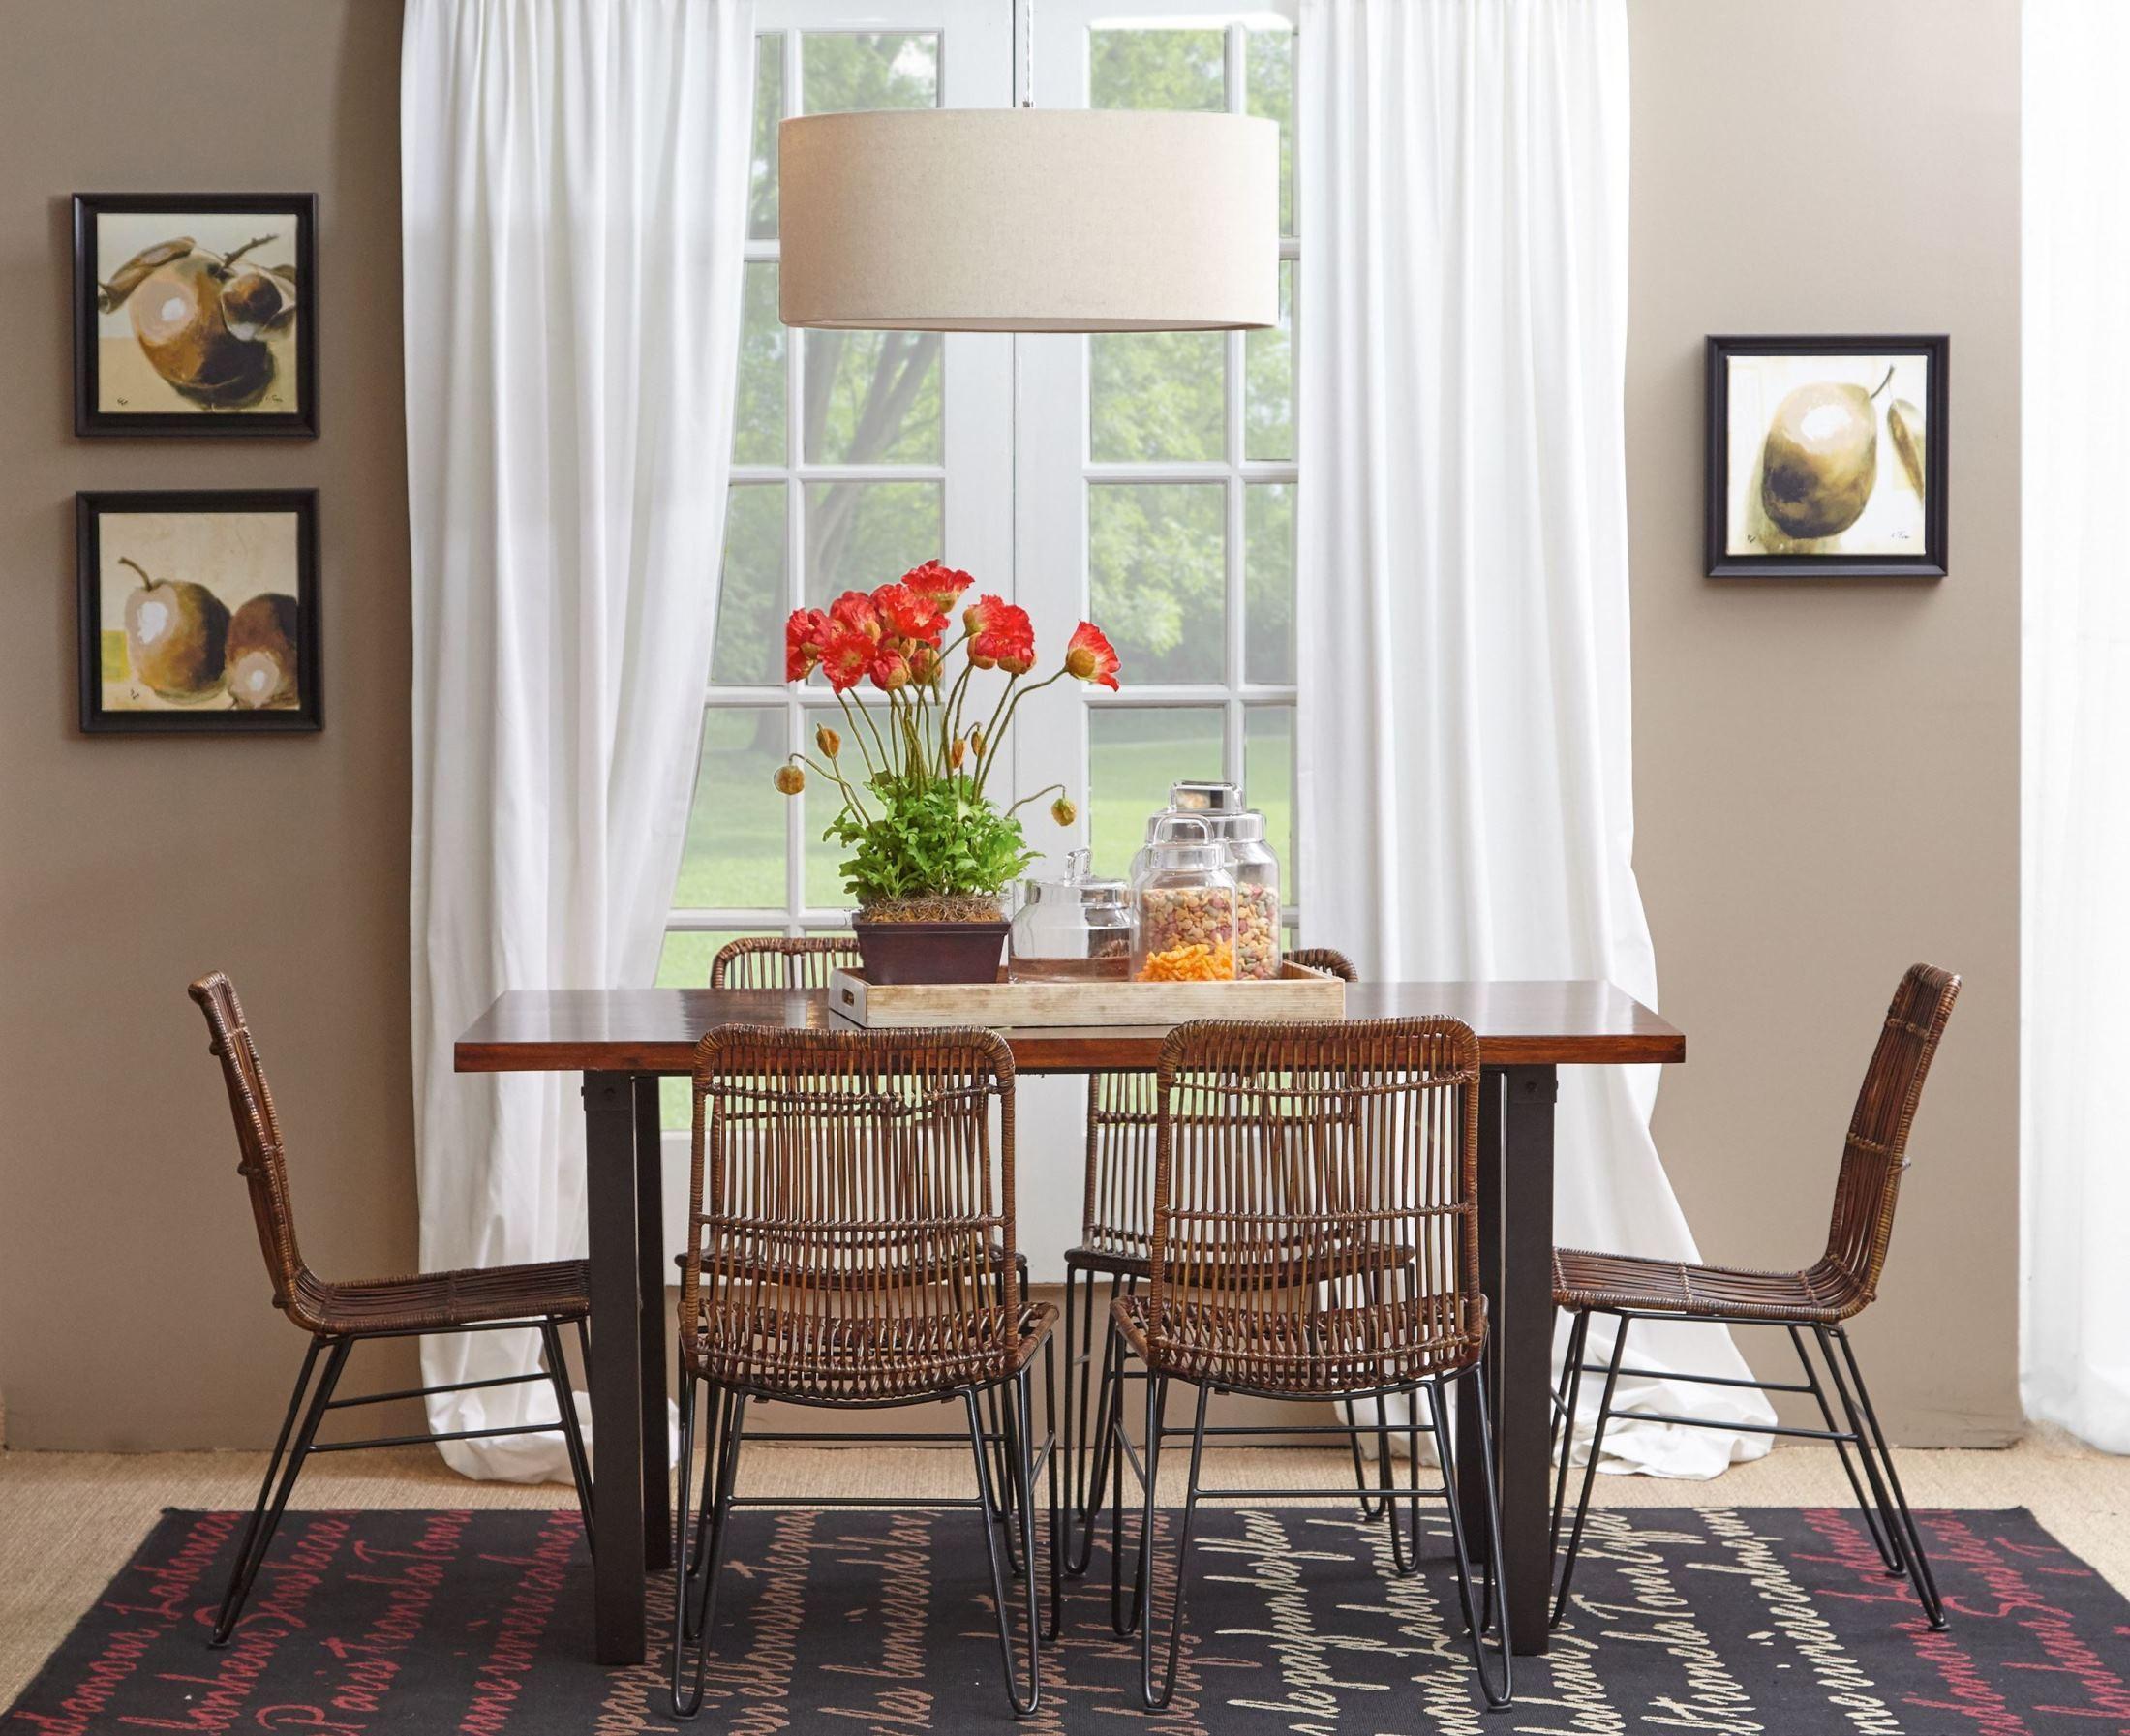 Urban Dweller Wood and Metal Dining Room Set from Jofran